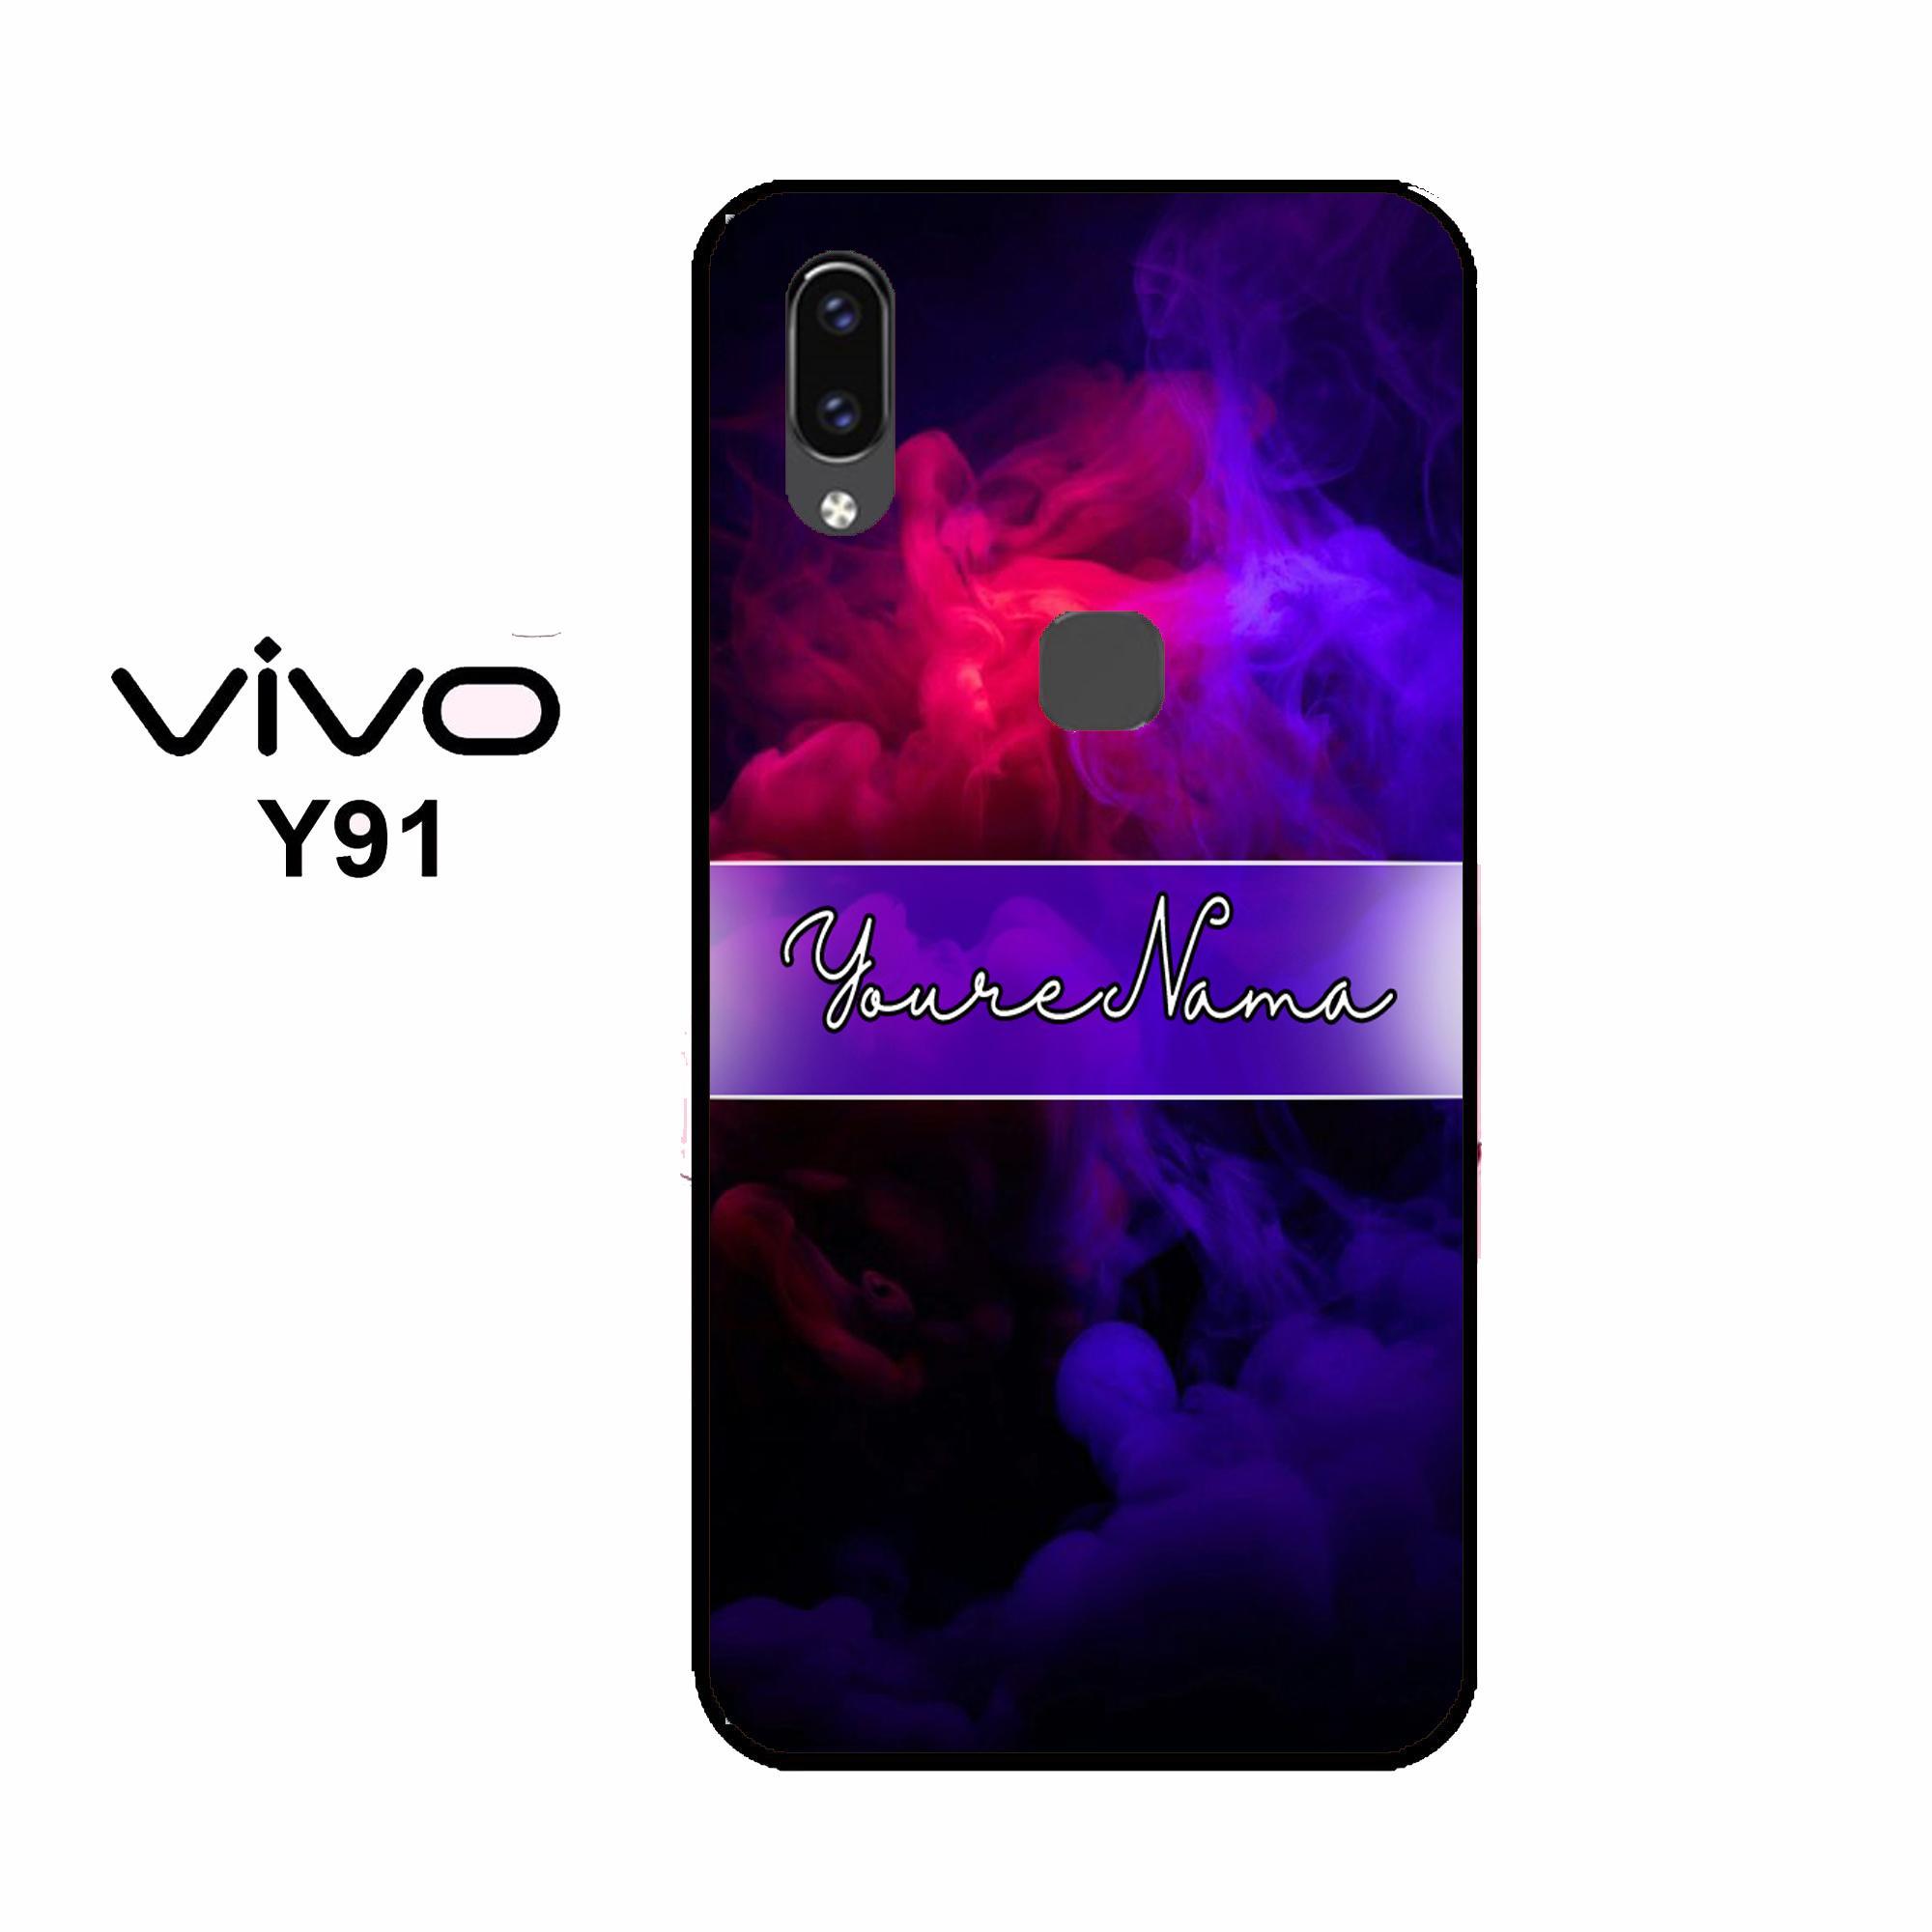 BCS Case Vivo Y91 Branded - 00282